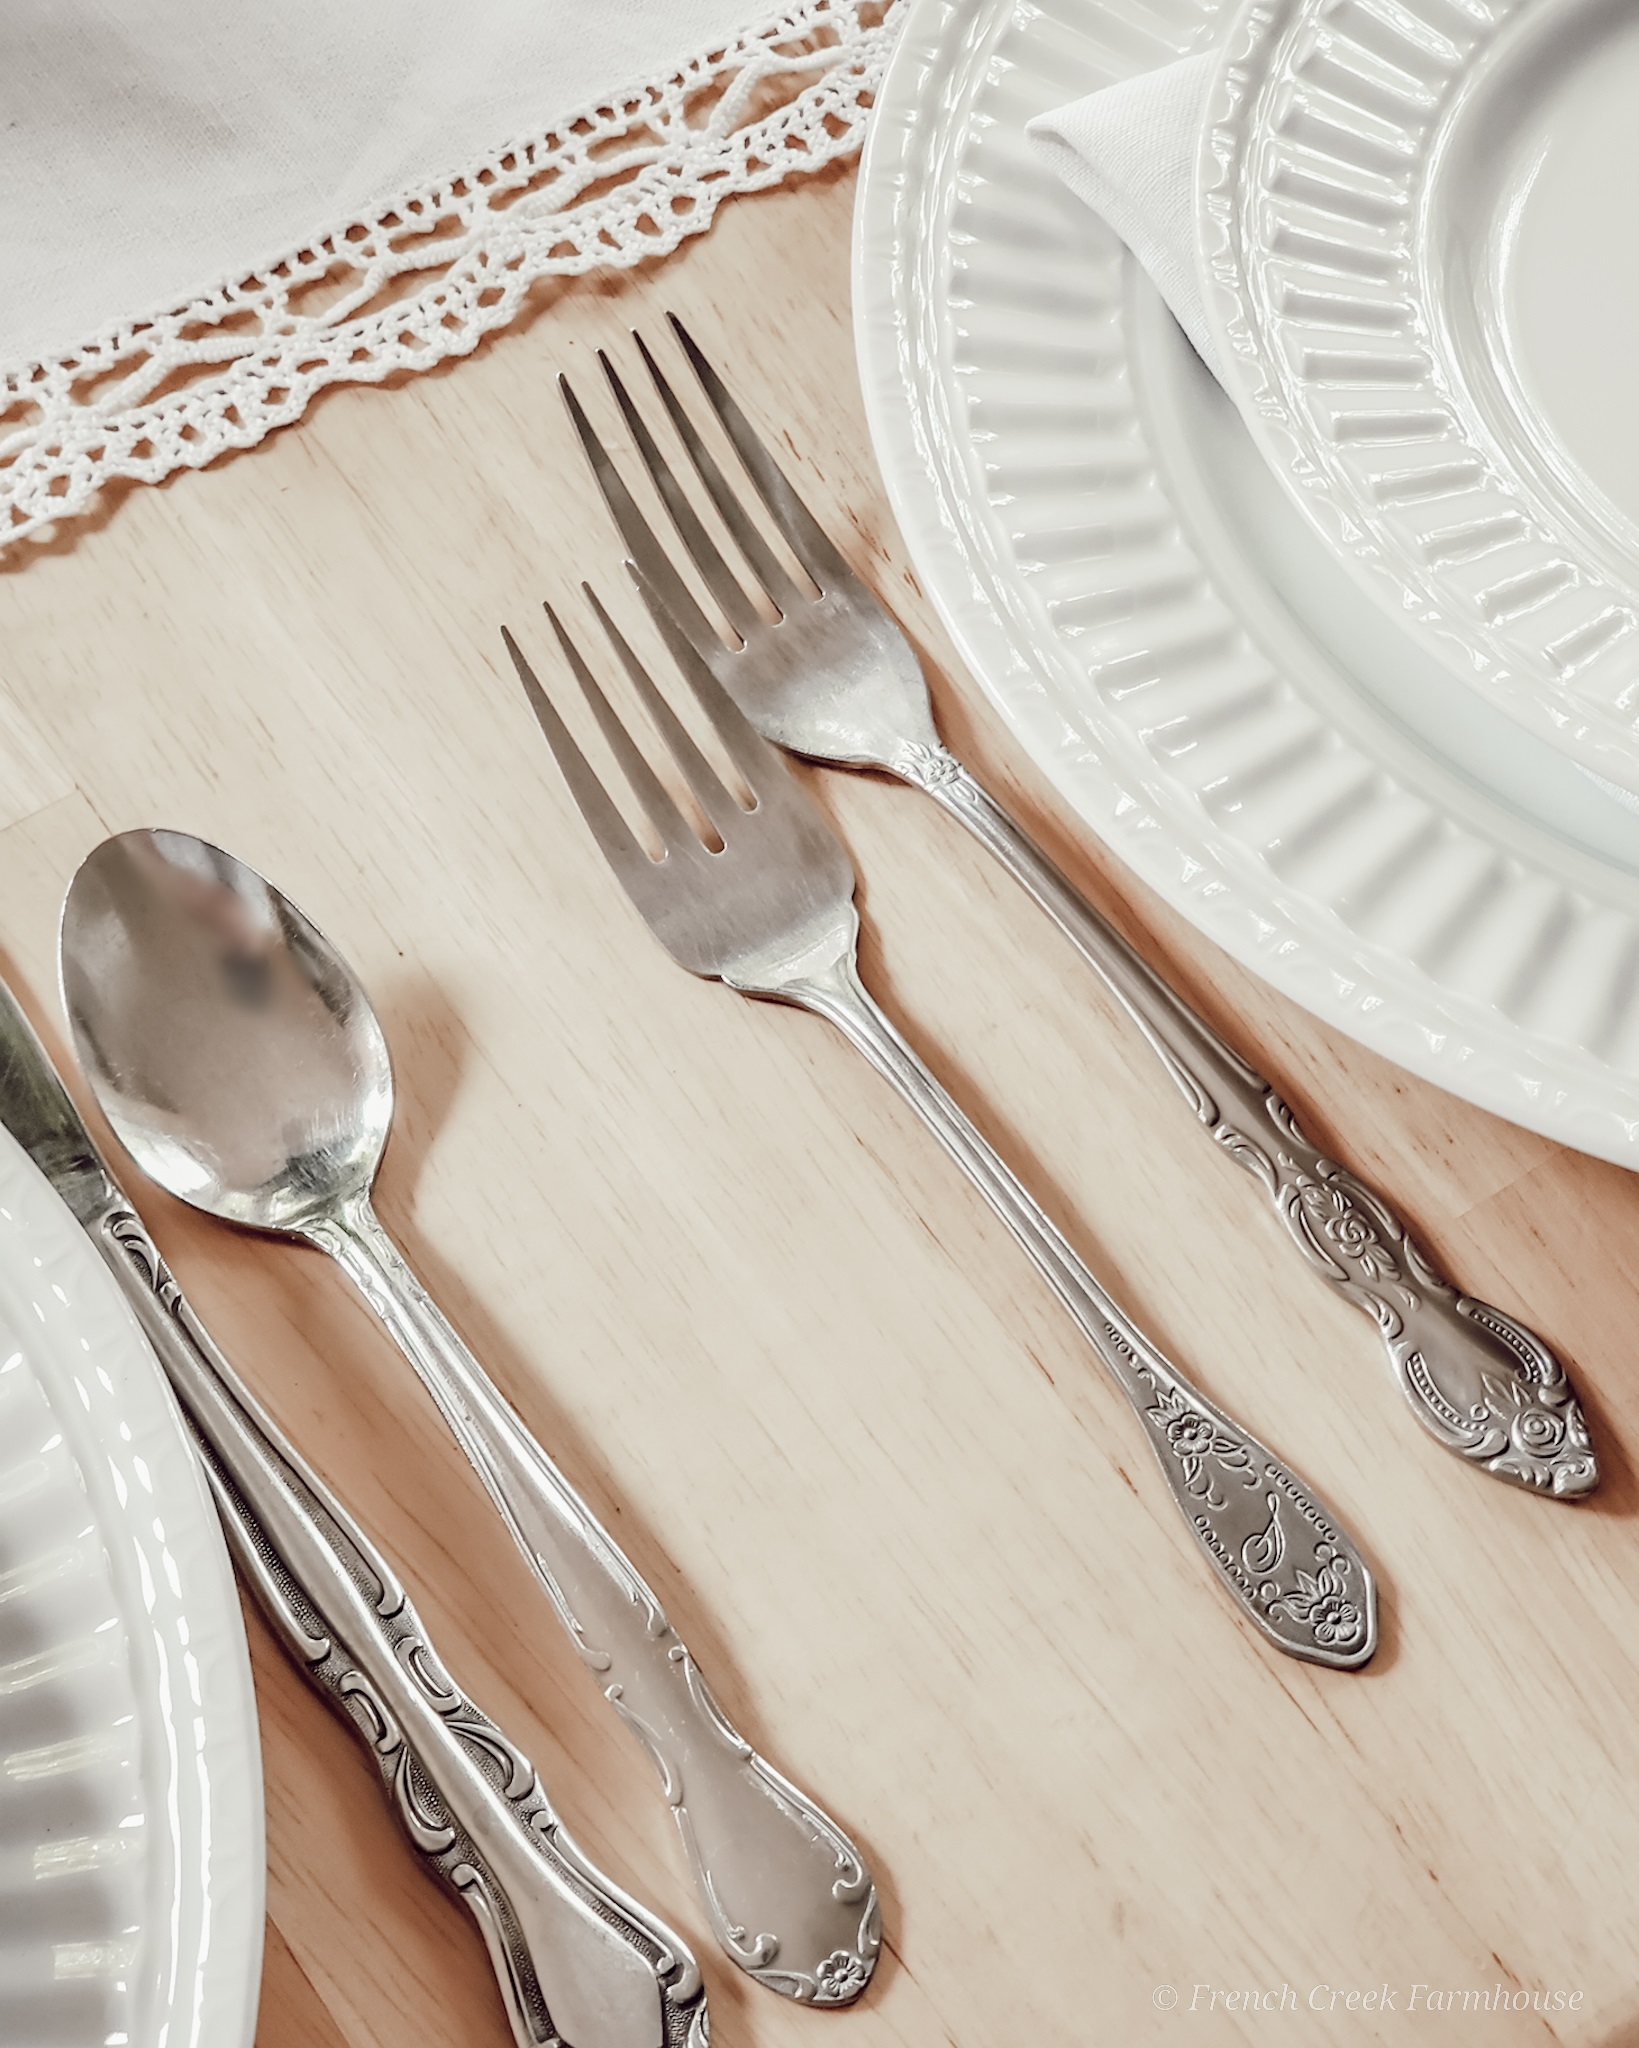 Mismatched vintage flatware is perfect for farmhouse tablescapes